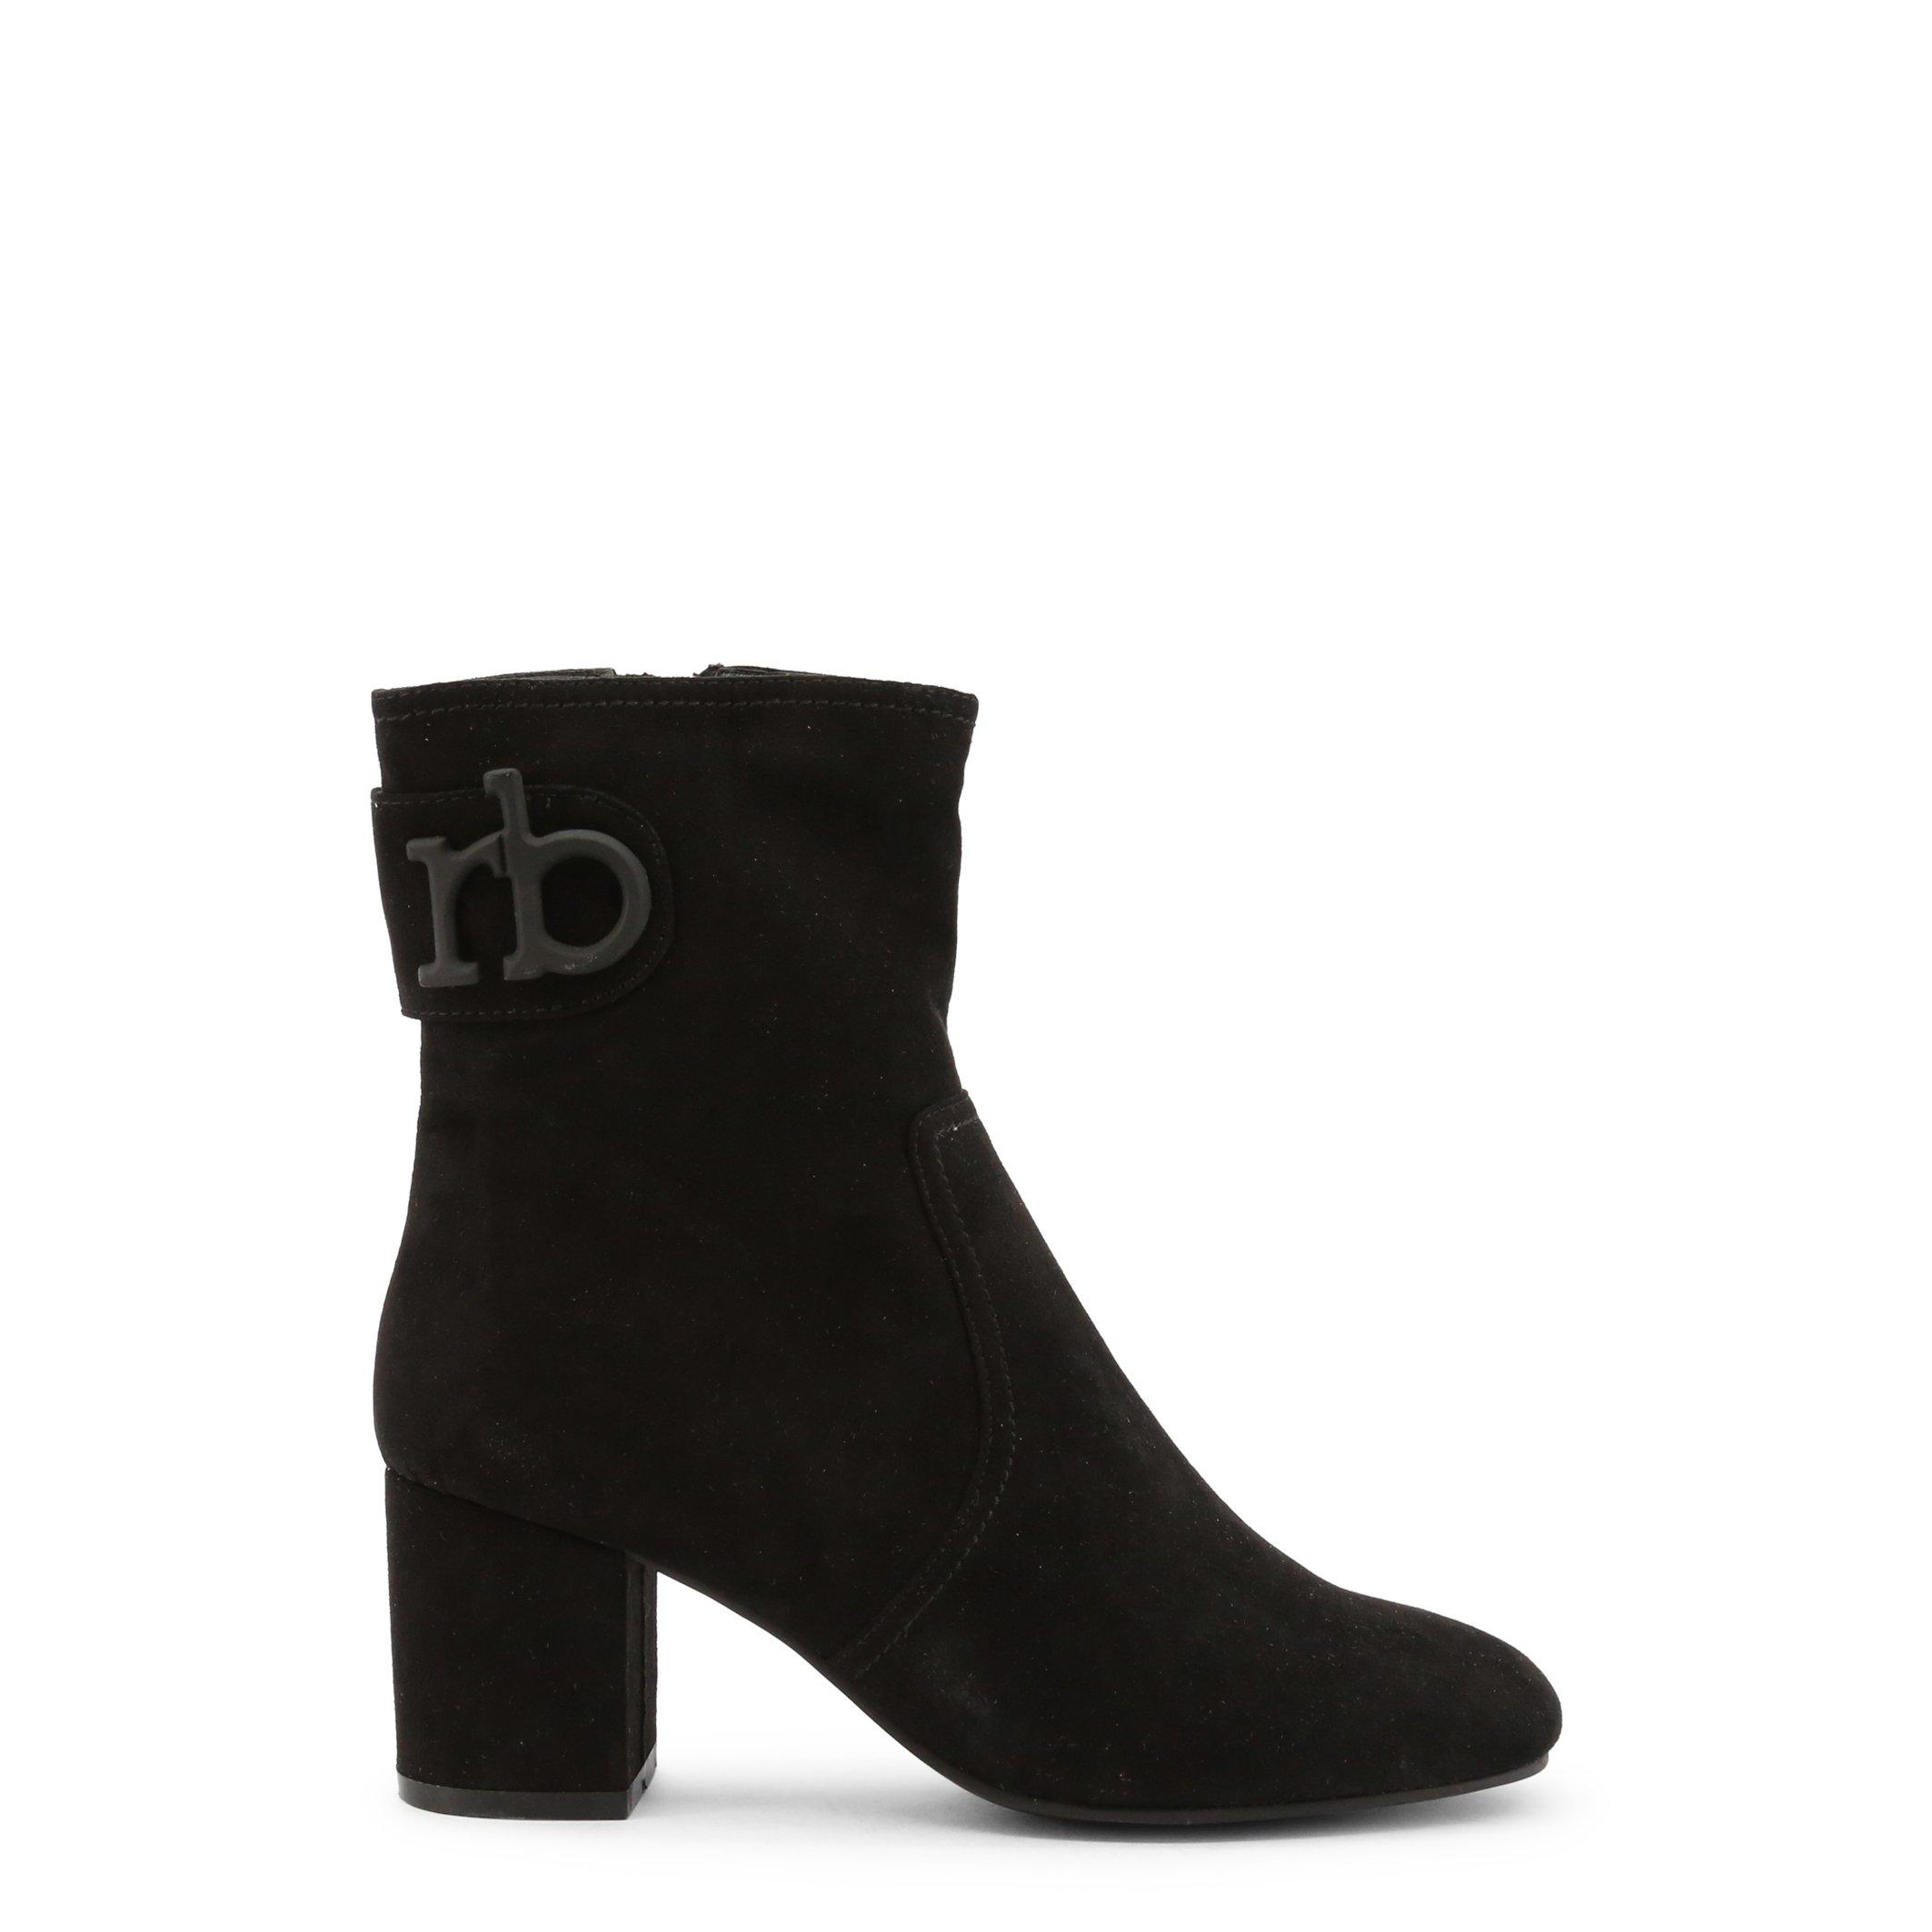 Roccobarocco Women's Ankle Boot Various Colours RBSC1J301STD - black EU 37